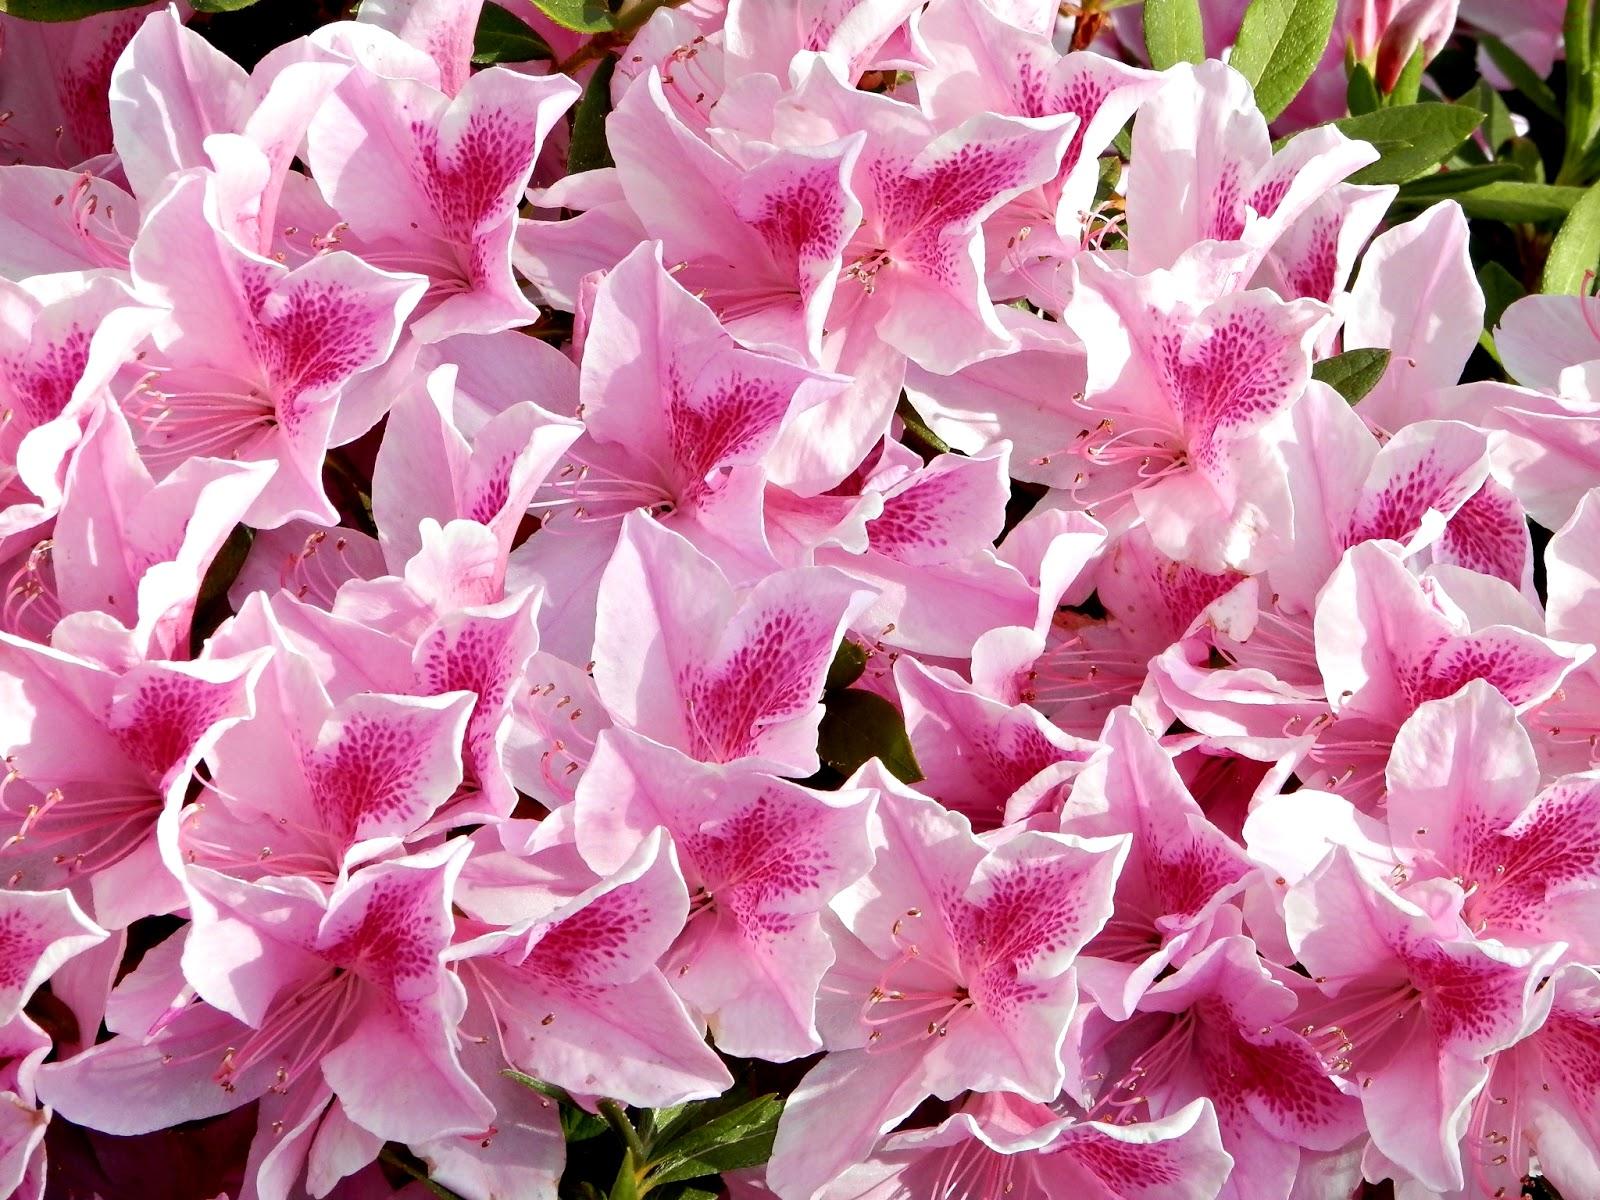 Blooming Iris Bed And Breakfast